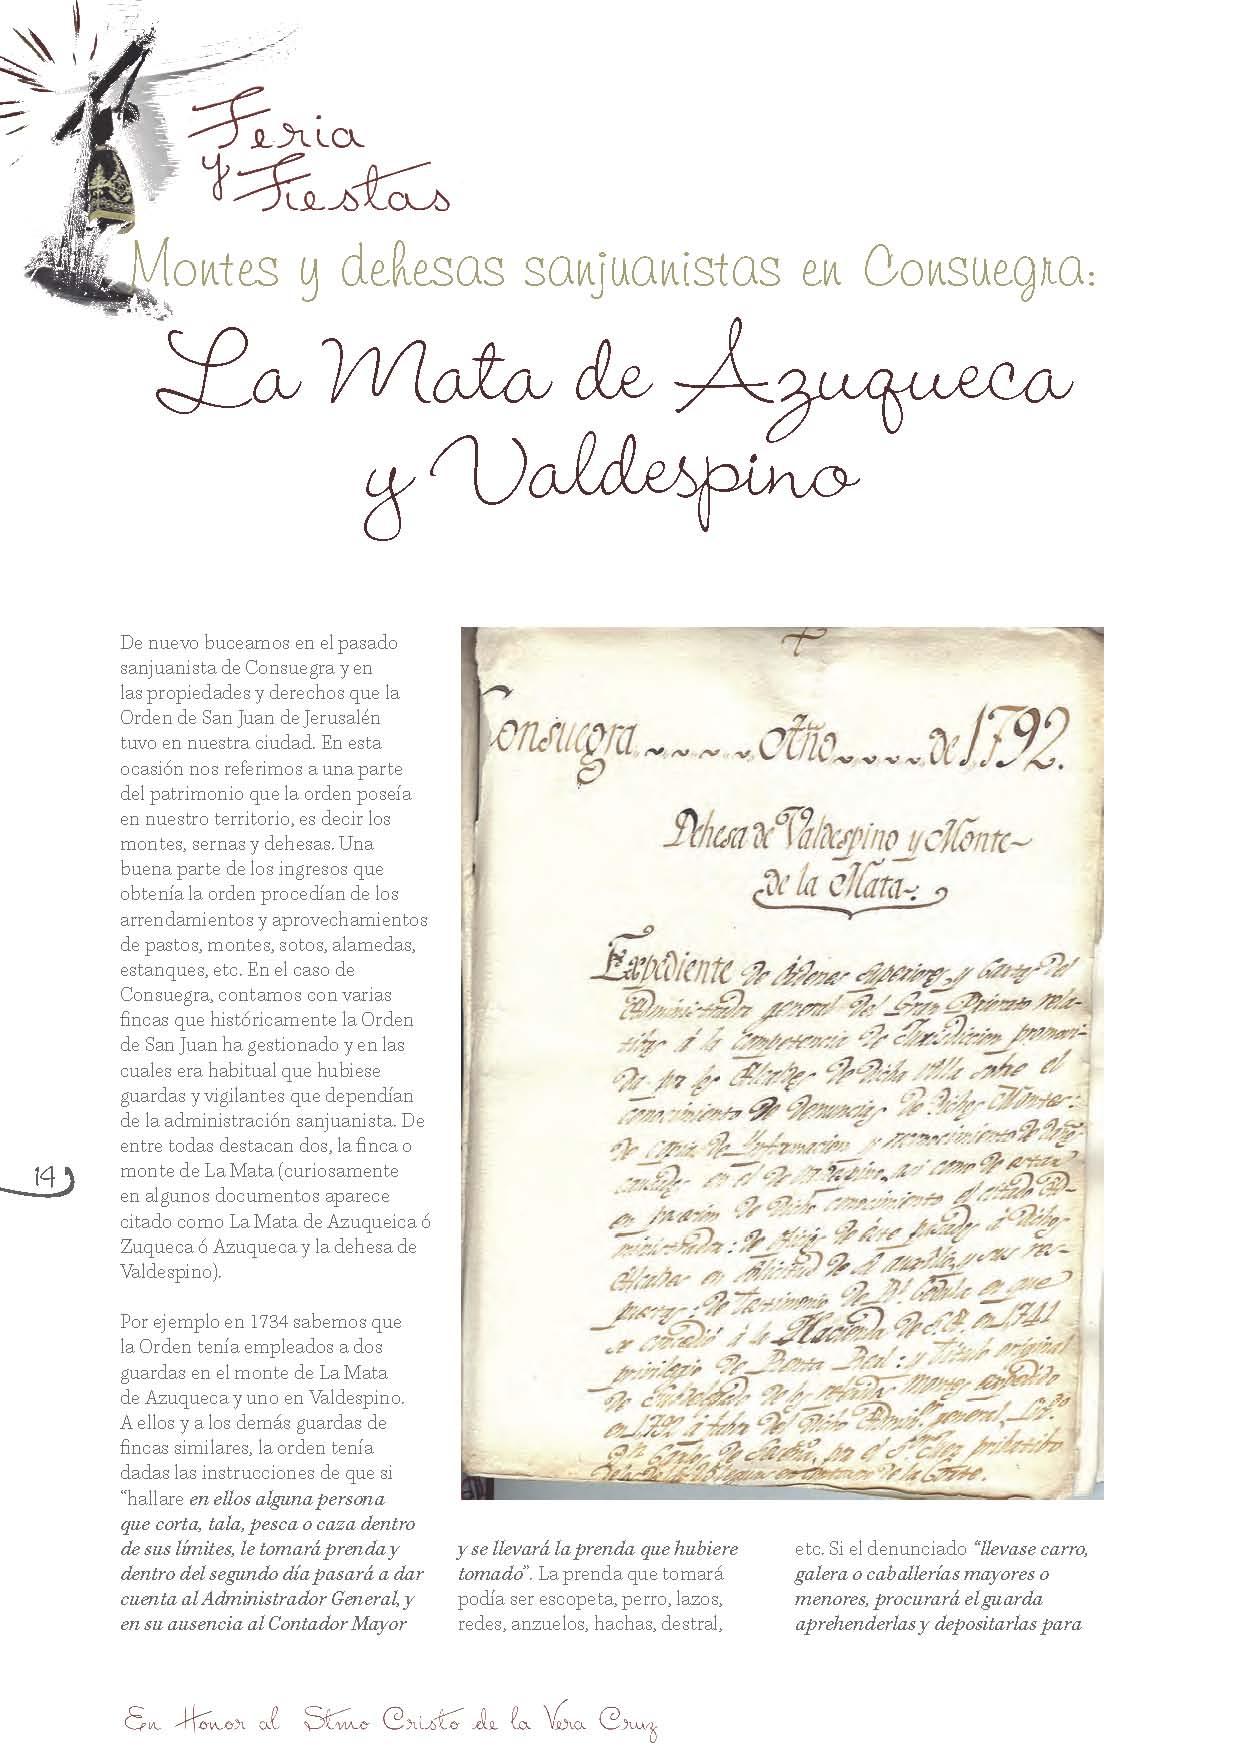 montes-y-dehesas-sanjuanitas-articulo-ferias2014-josegcano_Pgina_1.jpg - 204.03 KB